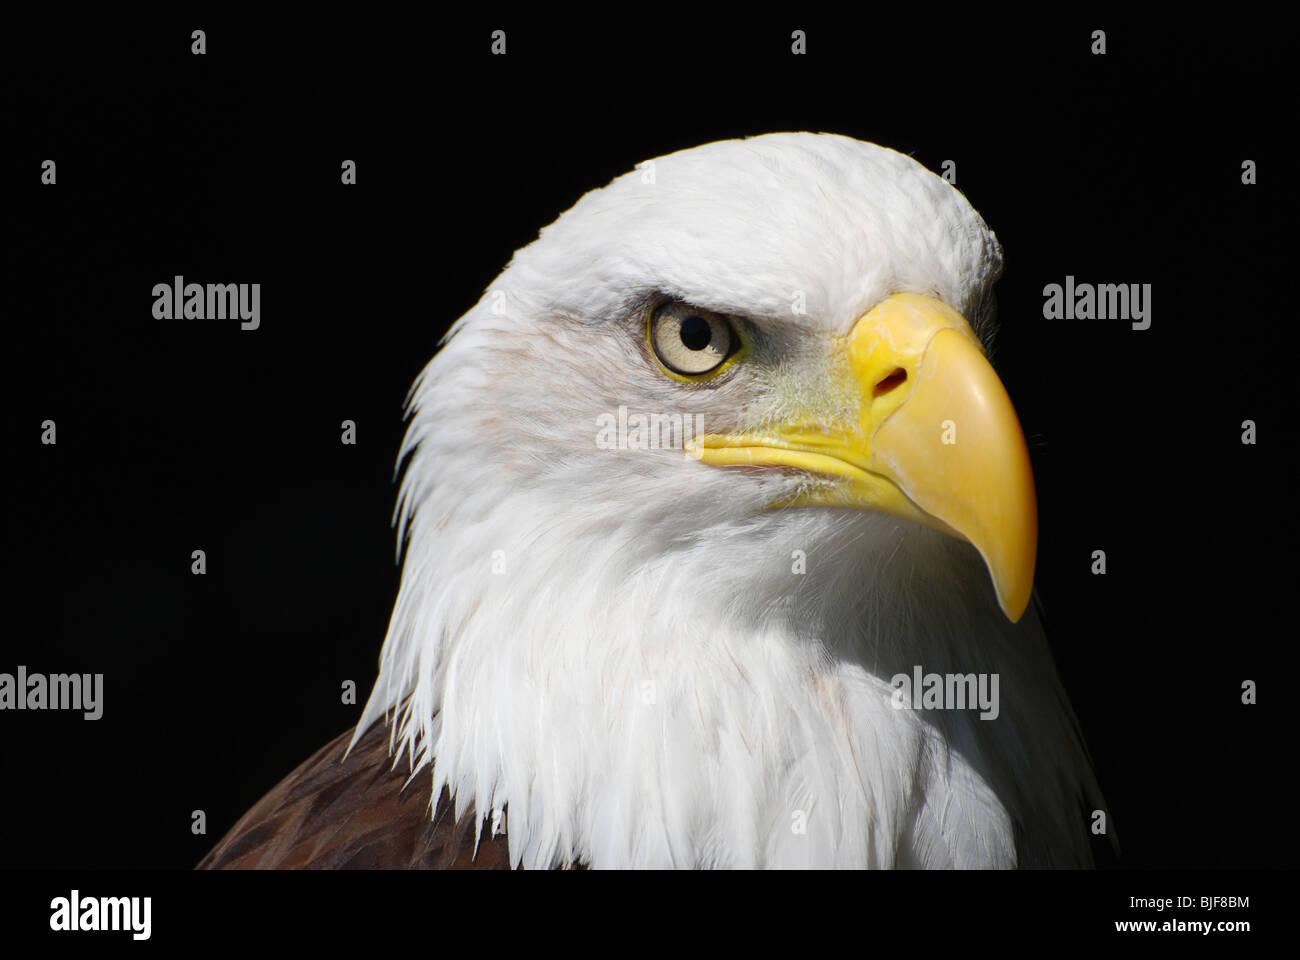 An American Bald Eagle - Stock Image